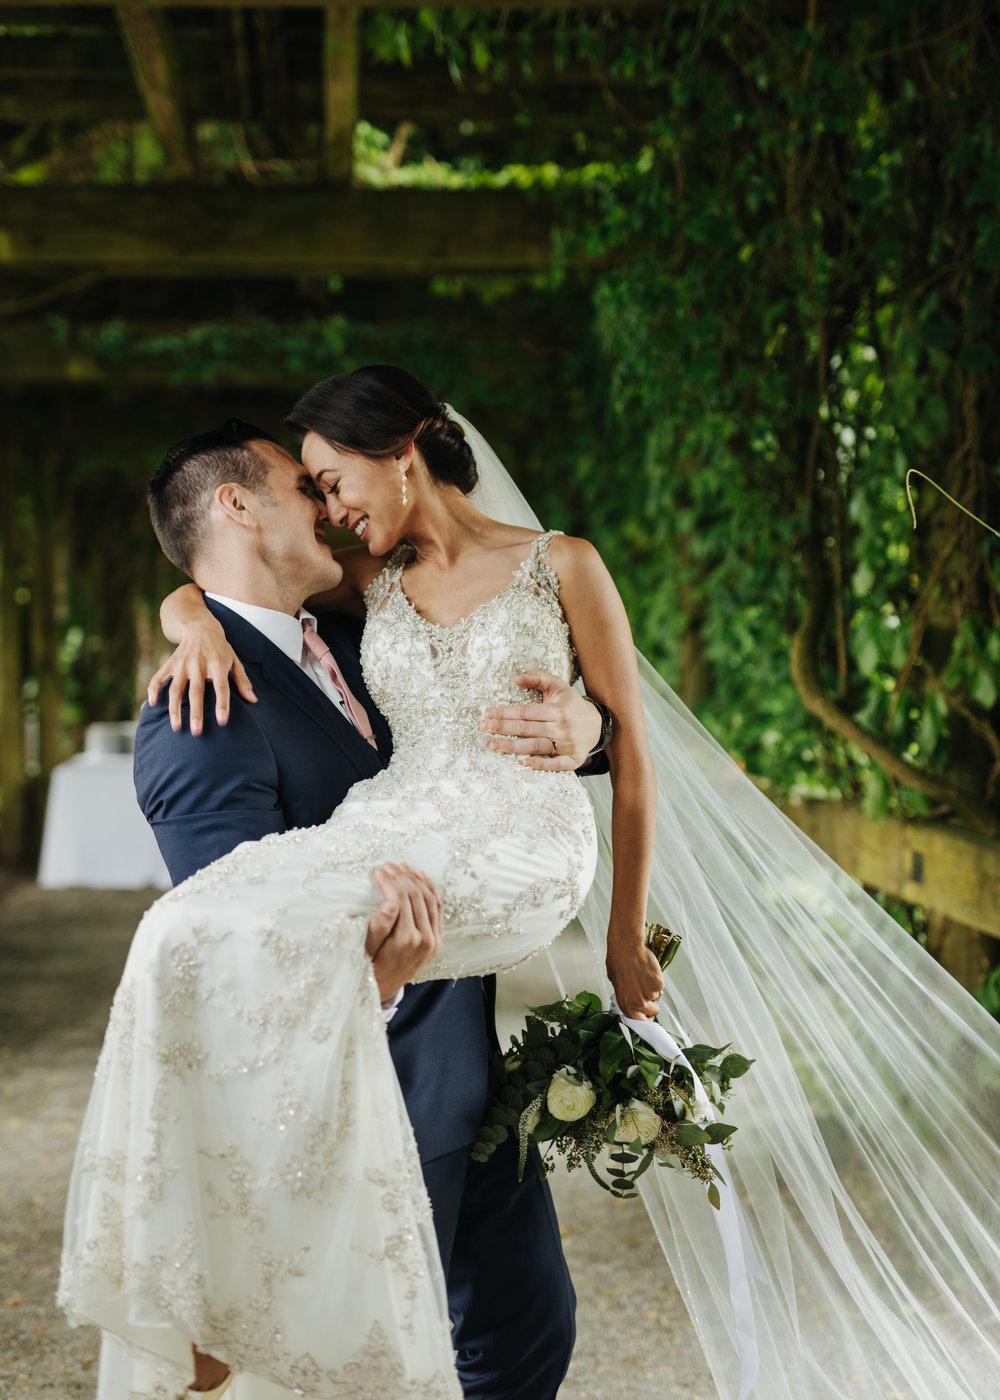 herafilms_wedding_jayne_connor_hera_selects-77.jpg